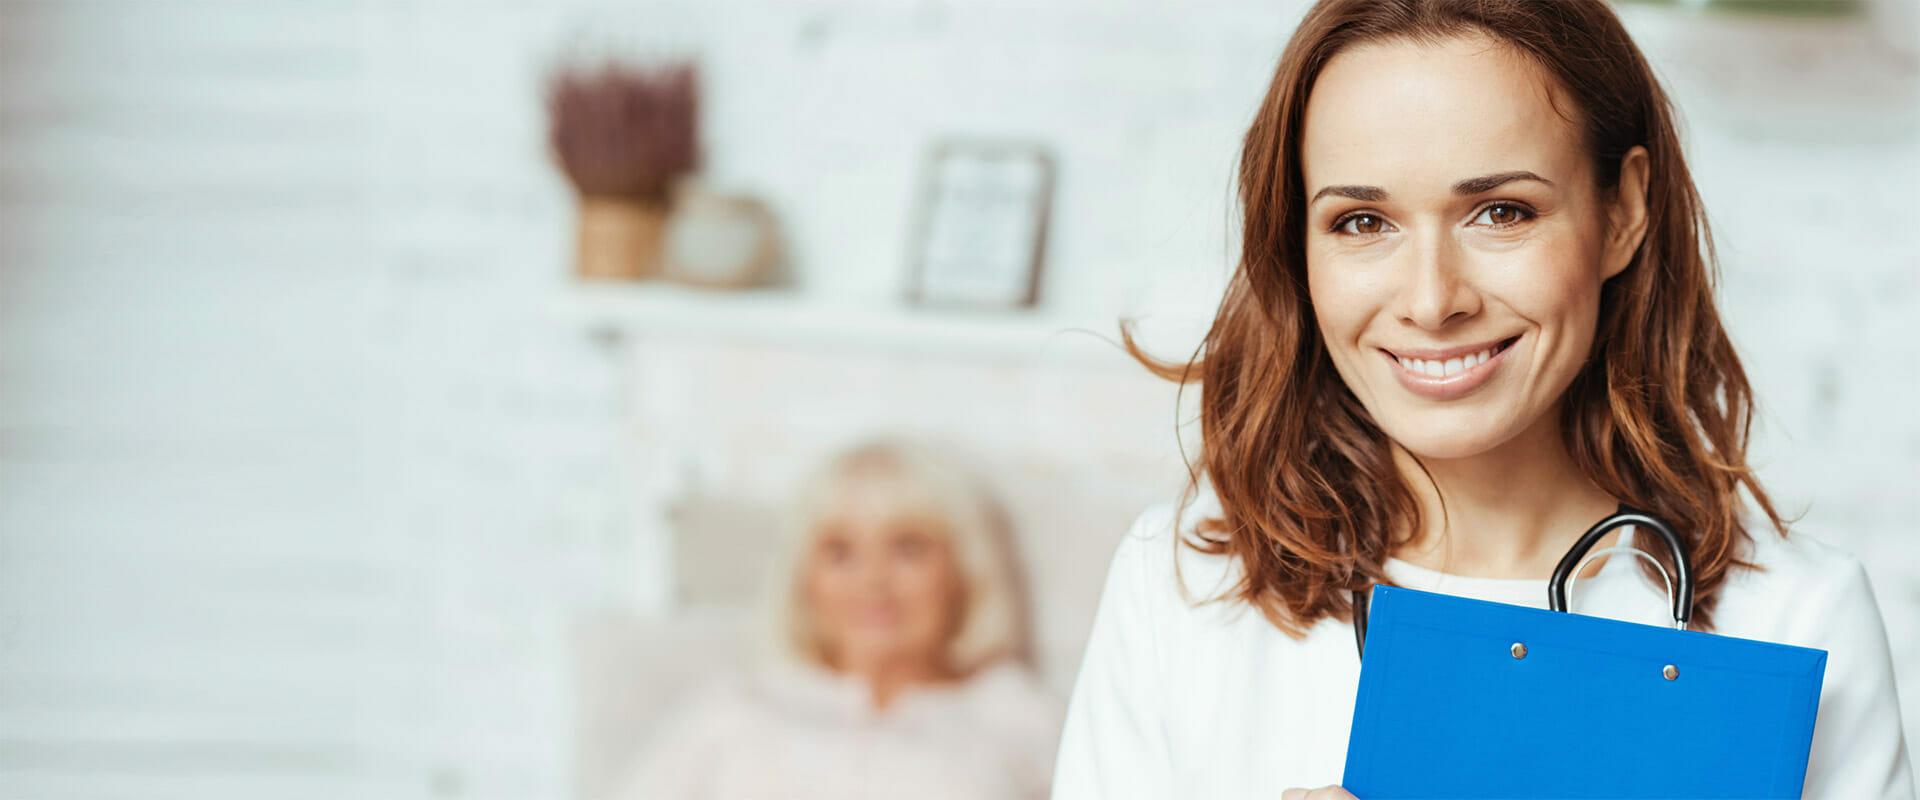 Case Management Skilled Nurses Nurseregistry